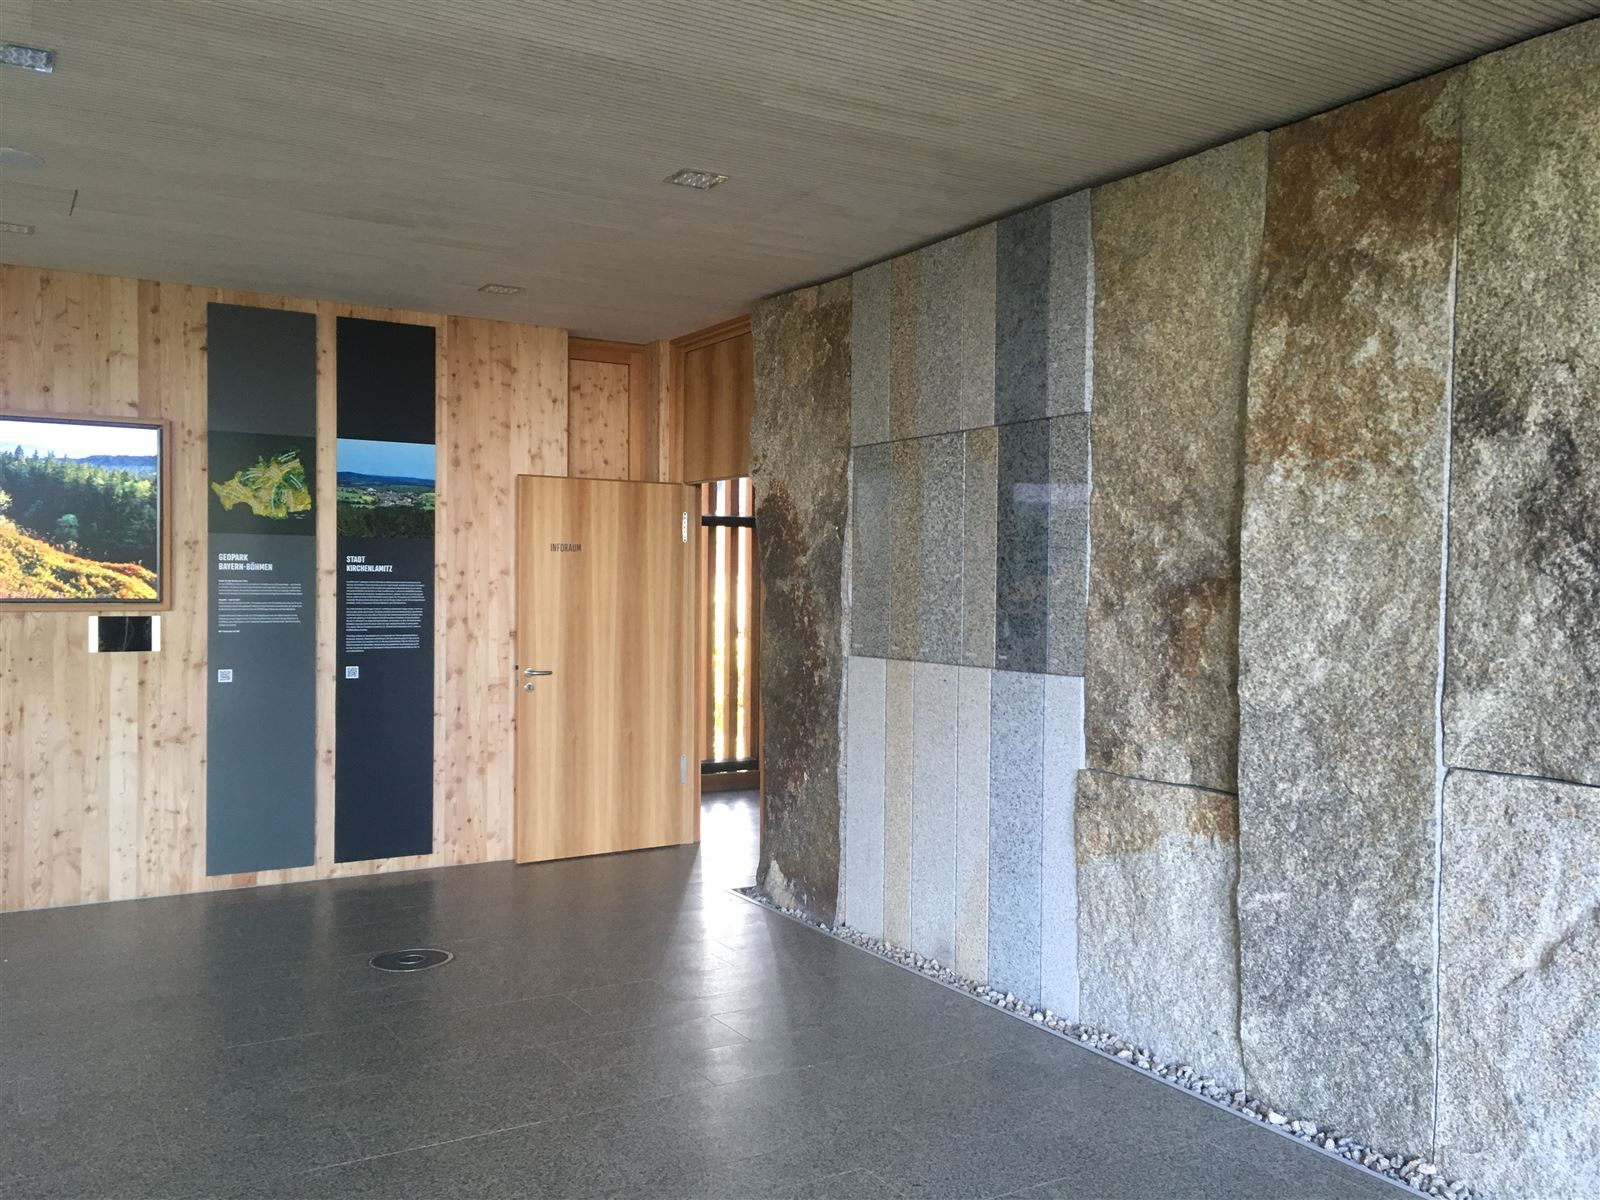 Informationszentrum Epprechtstein